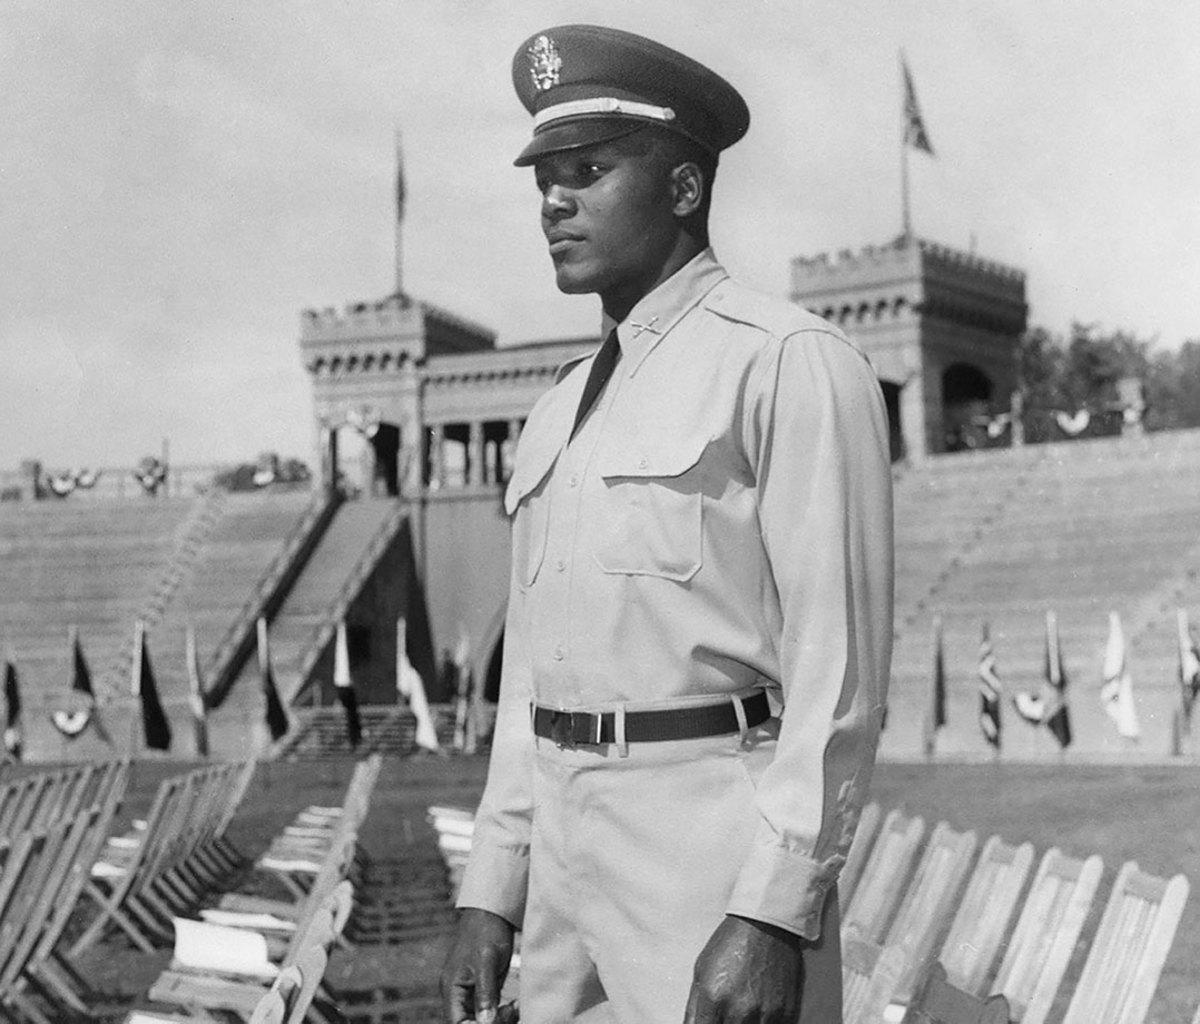 1955-Jim-Brown-ROTC-uniform.jpg